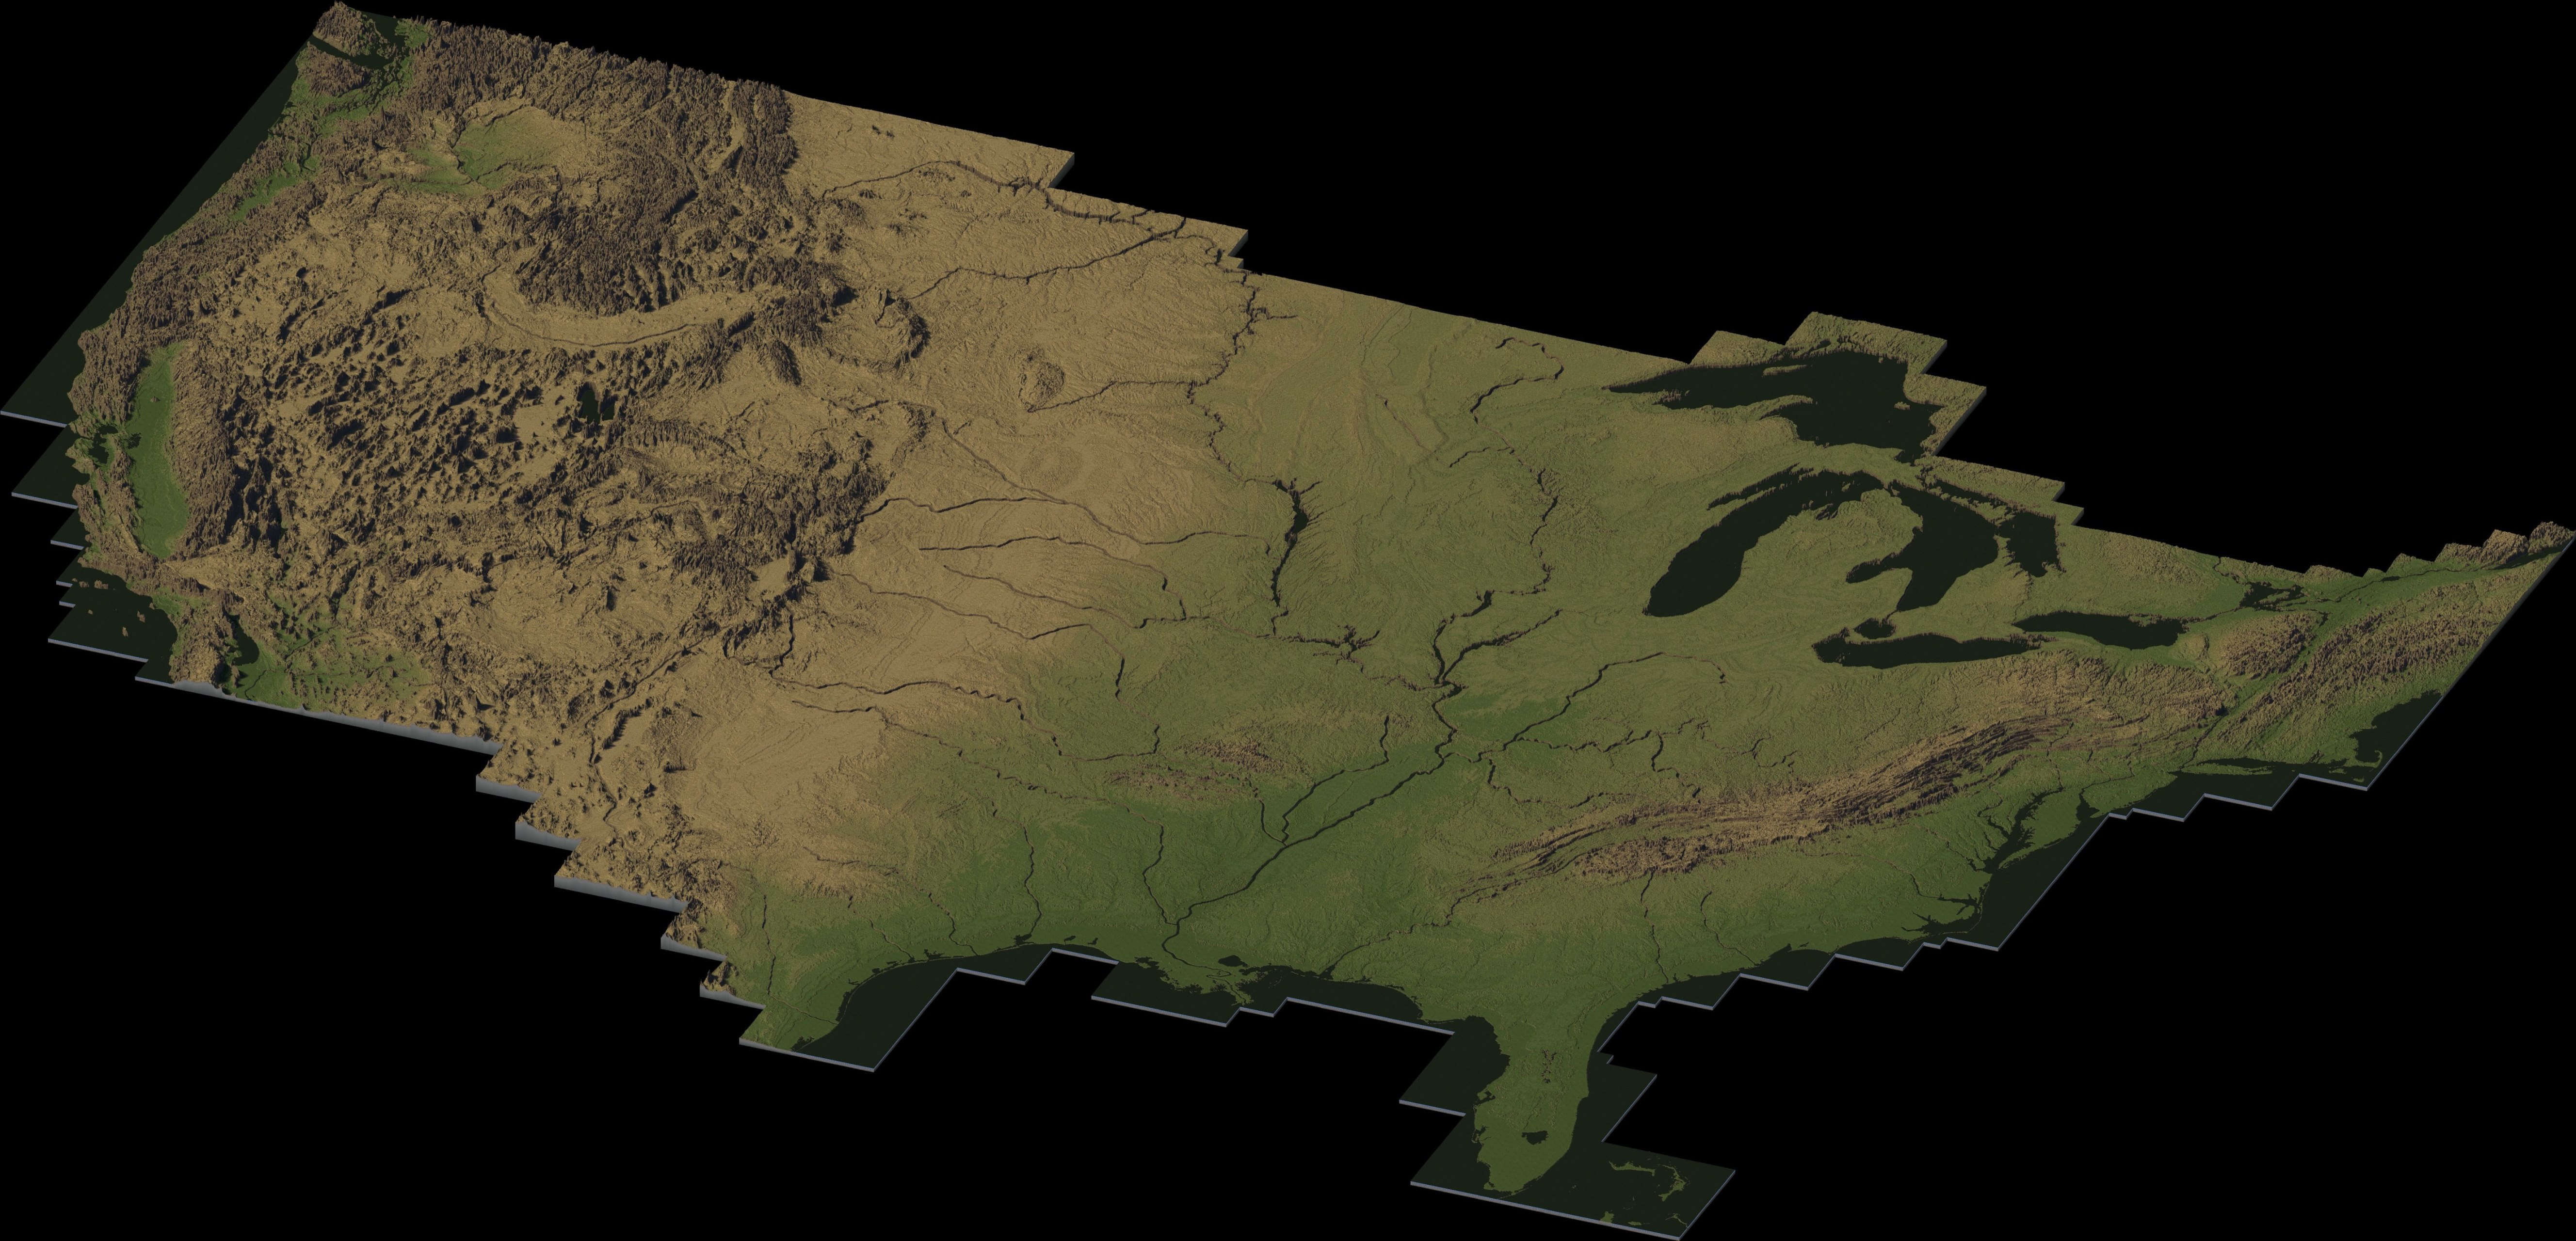 Contiguous United States - Maps - Simtropolis